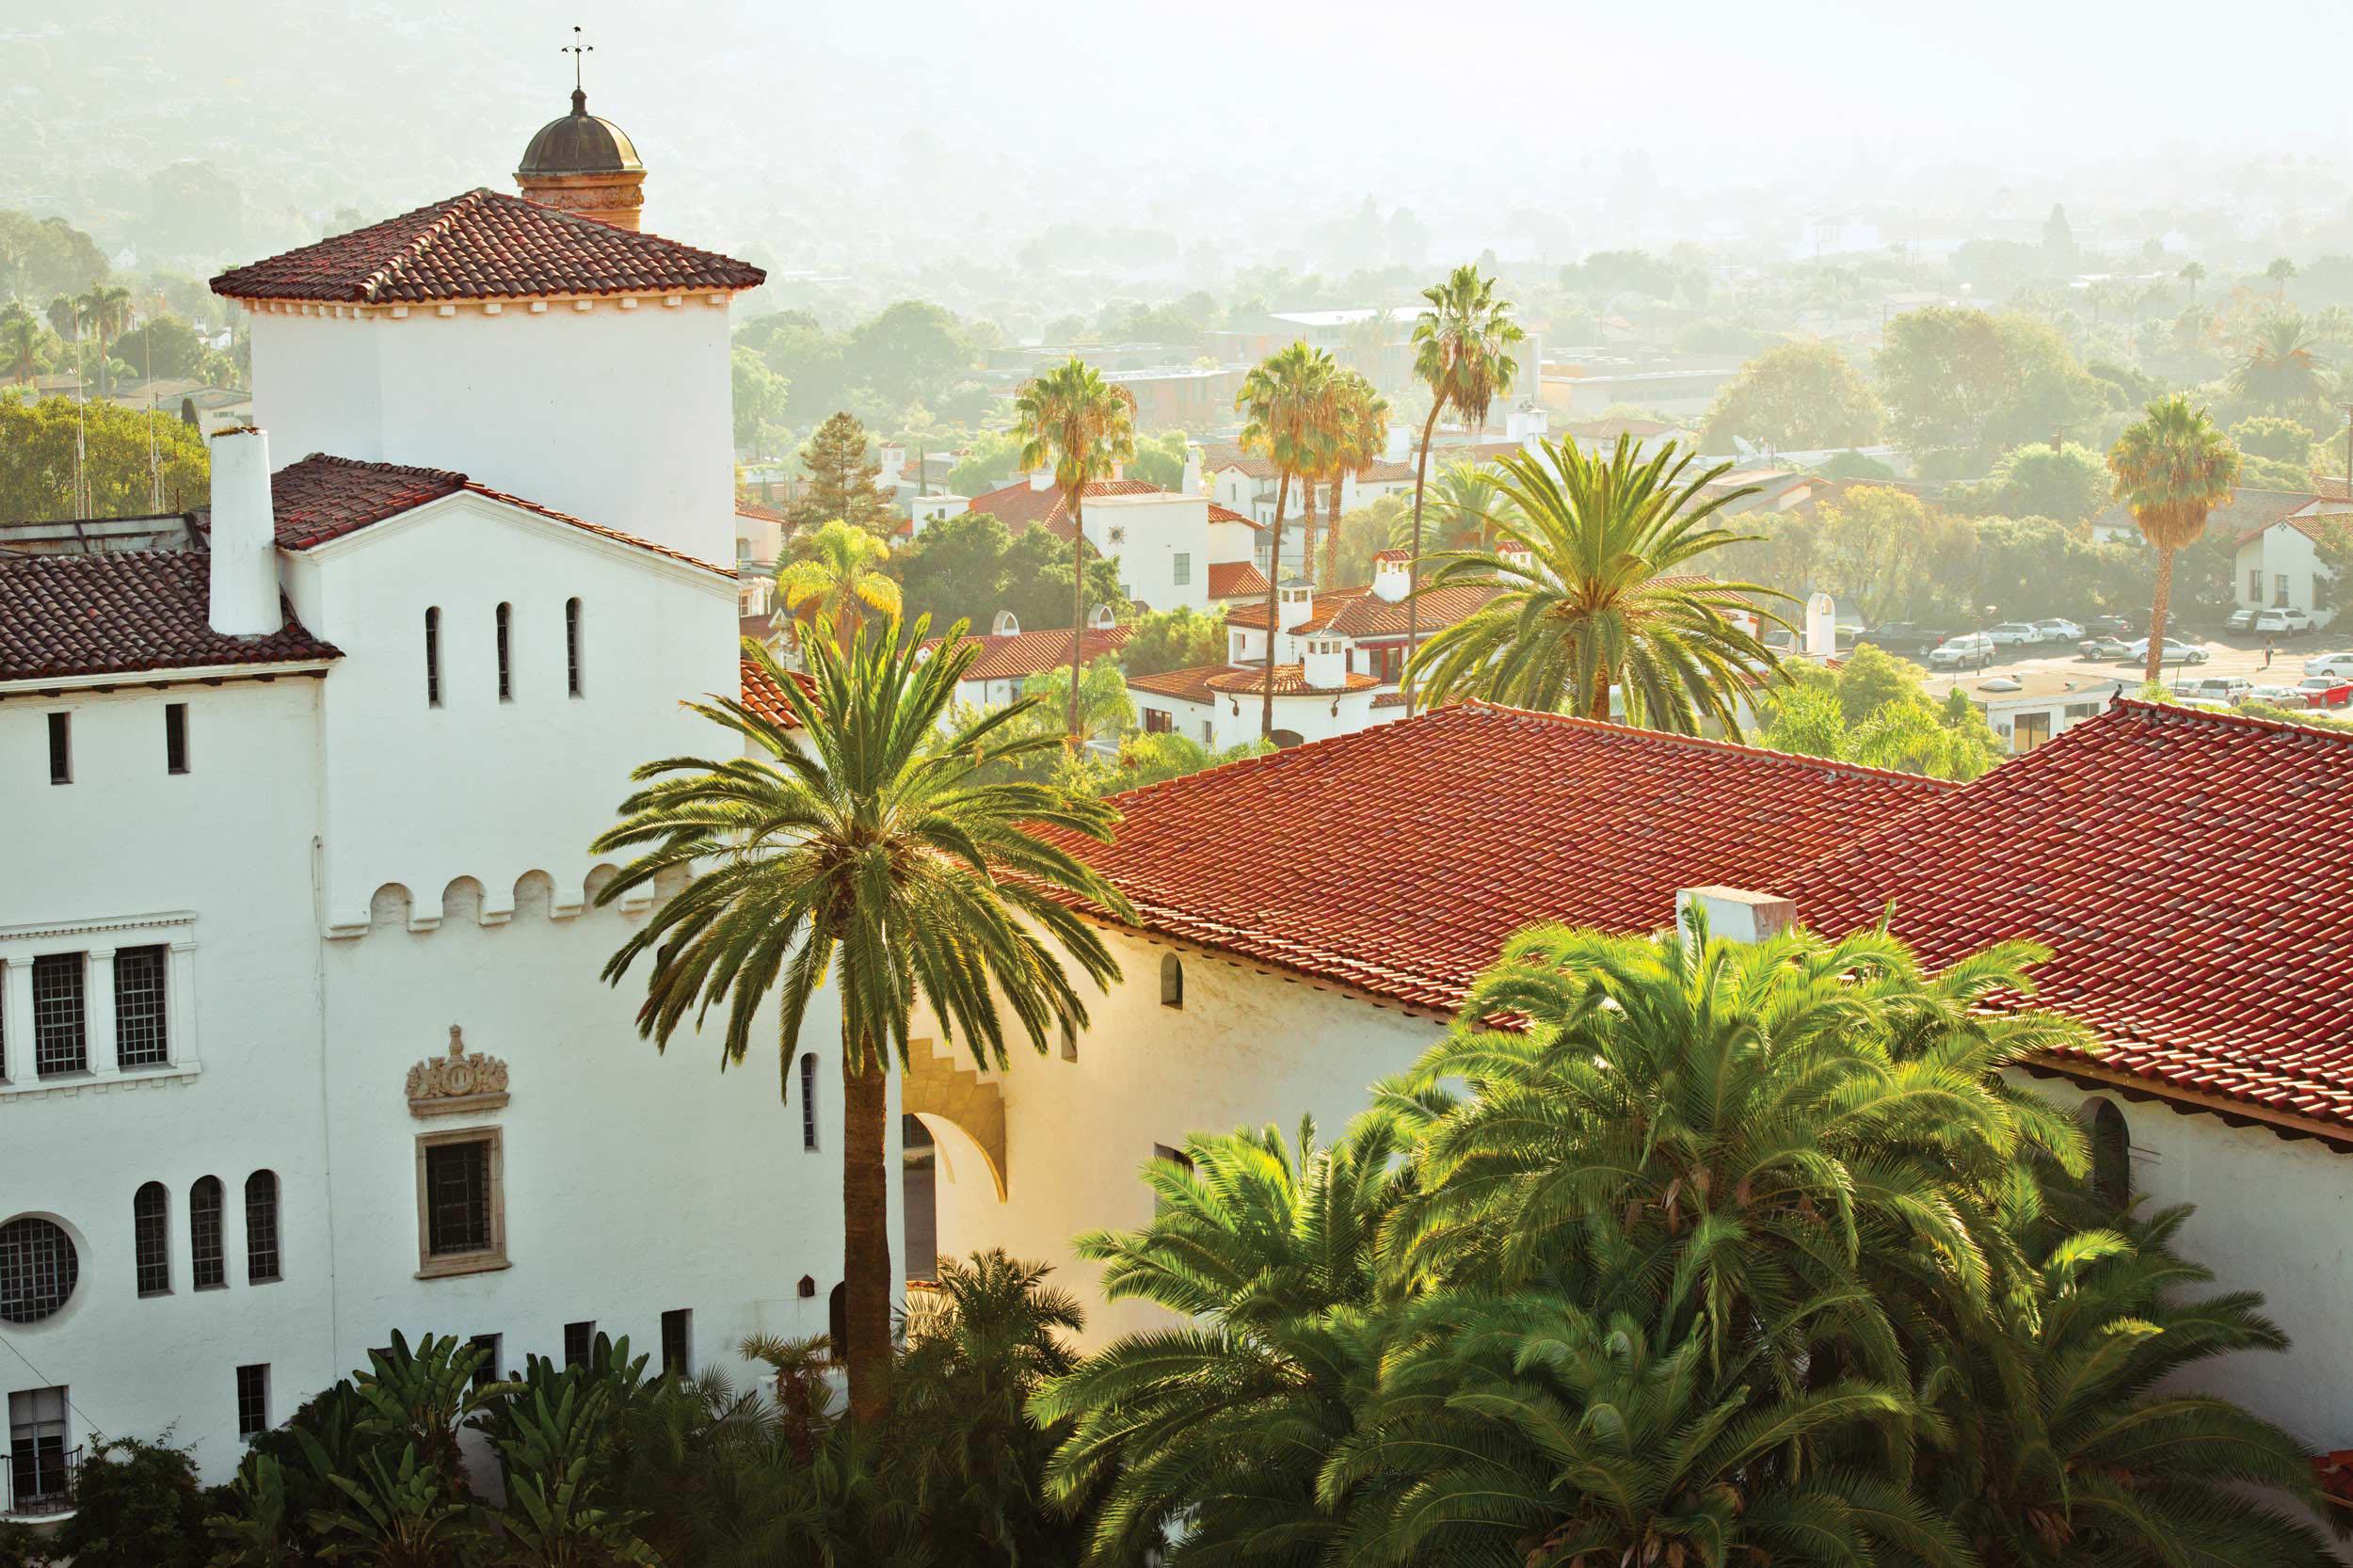 Santa Barbara, Ca | Hotels, Restaurants, Events & Activities Intended For Santa Barbara County Courthouse Calendar